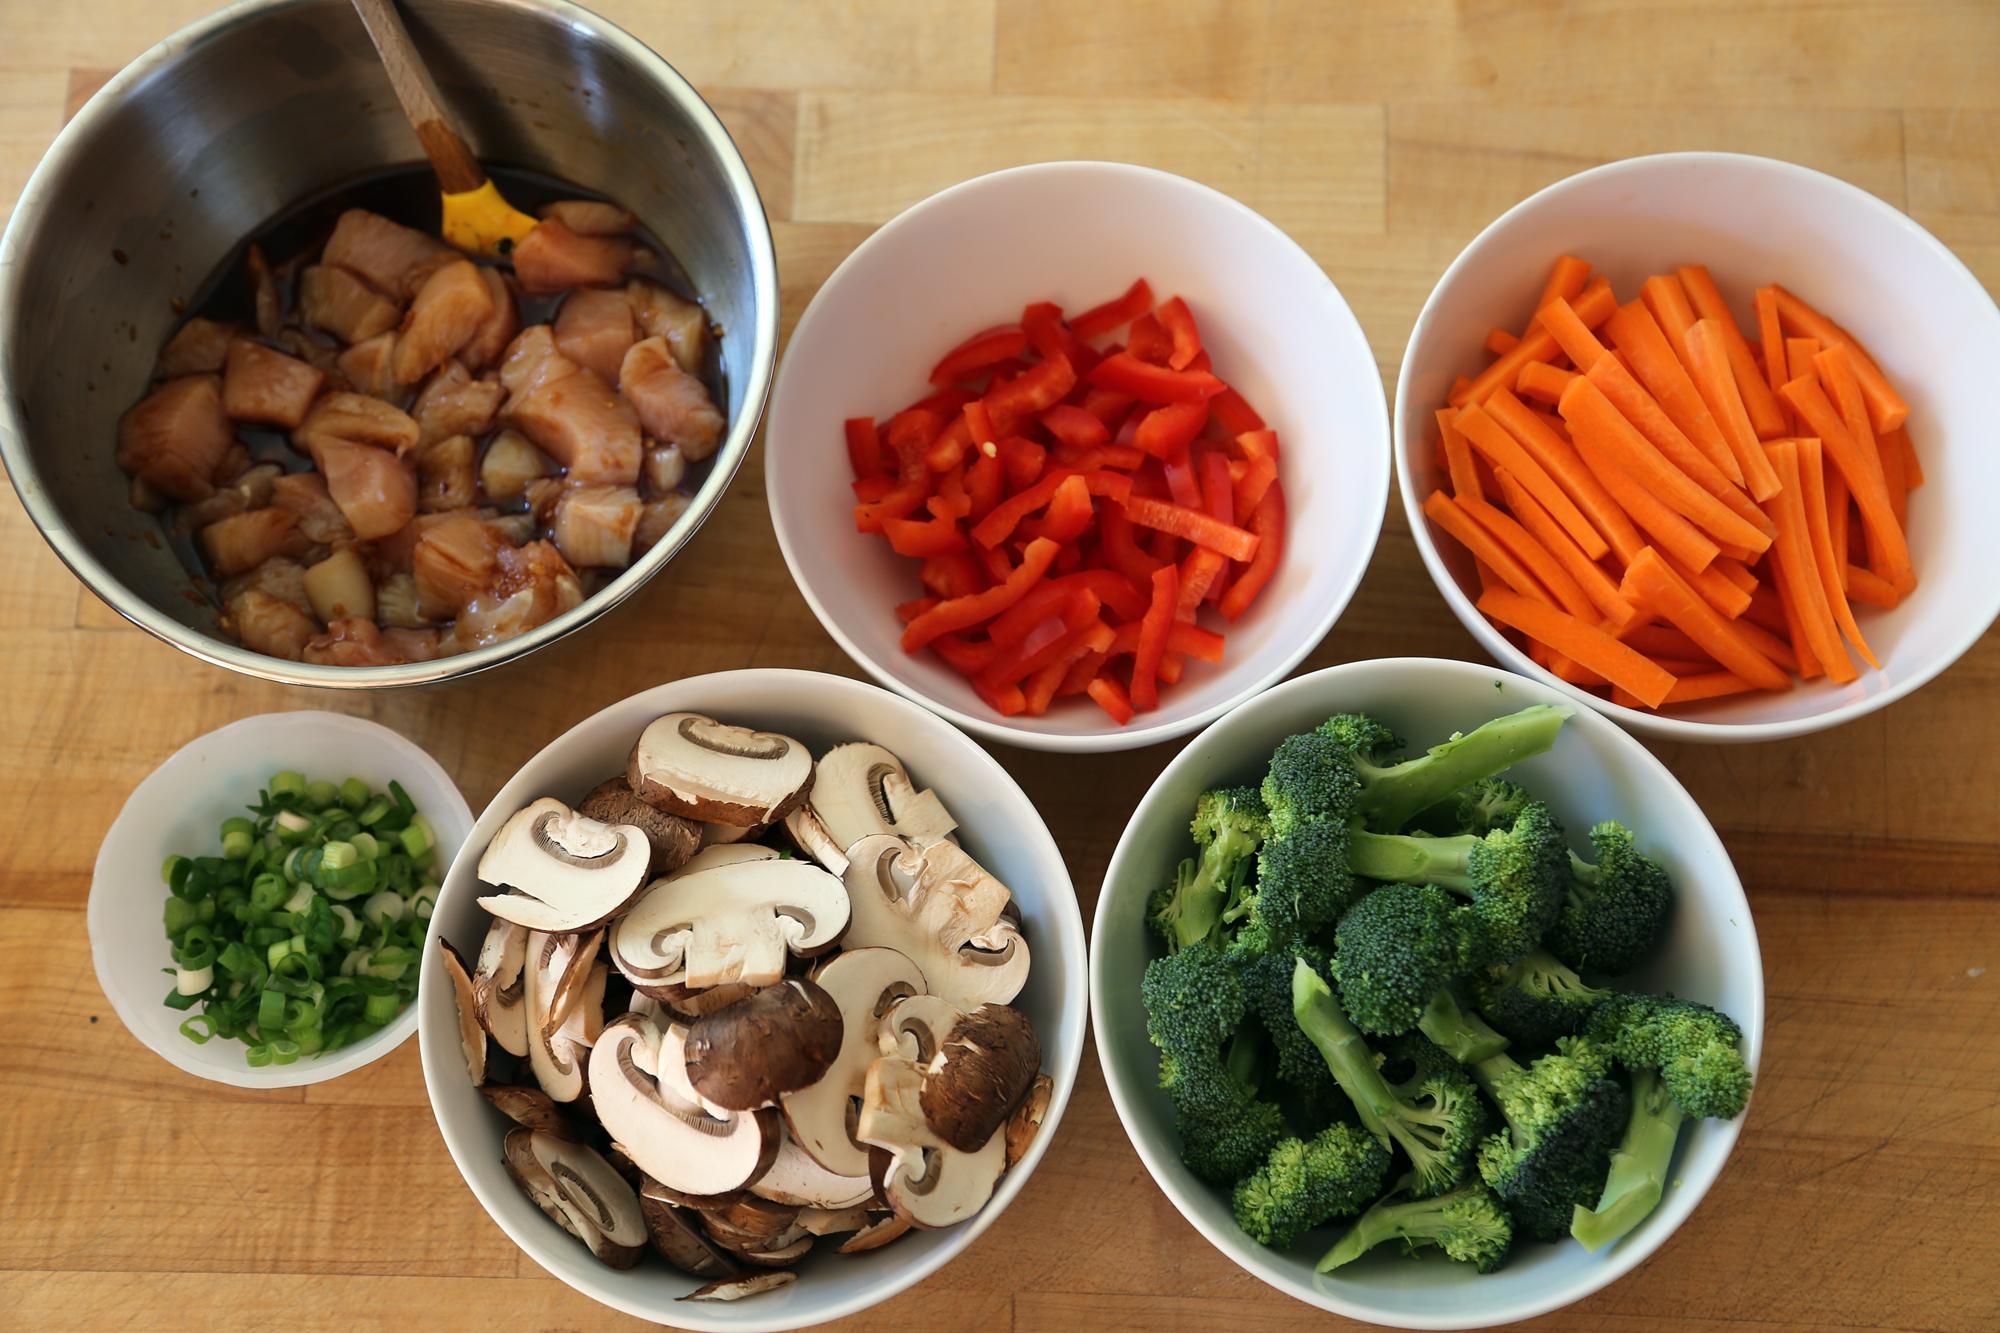 Basic Stir-Fry Ingredients prepped